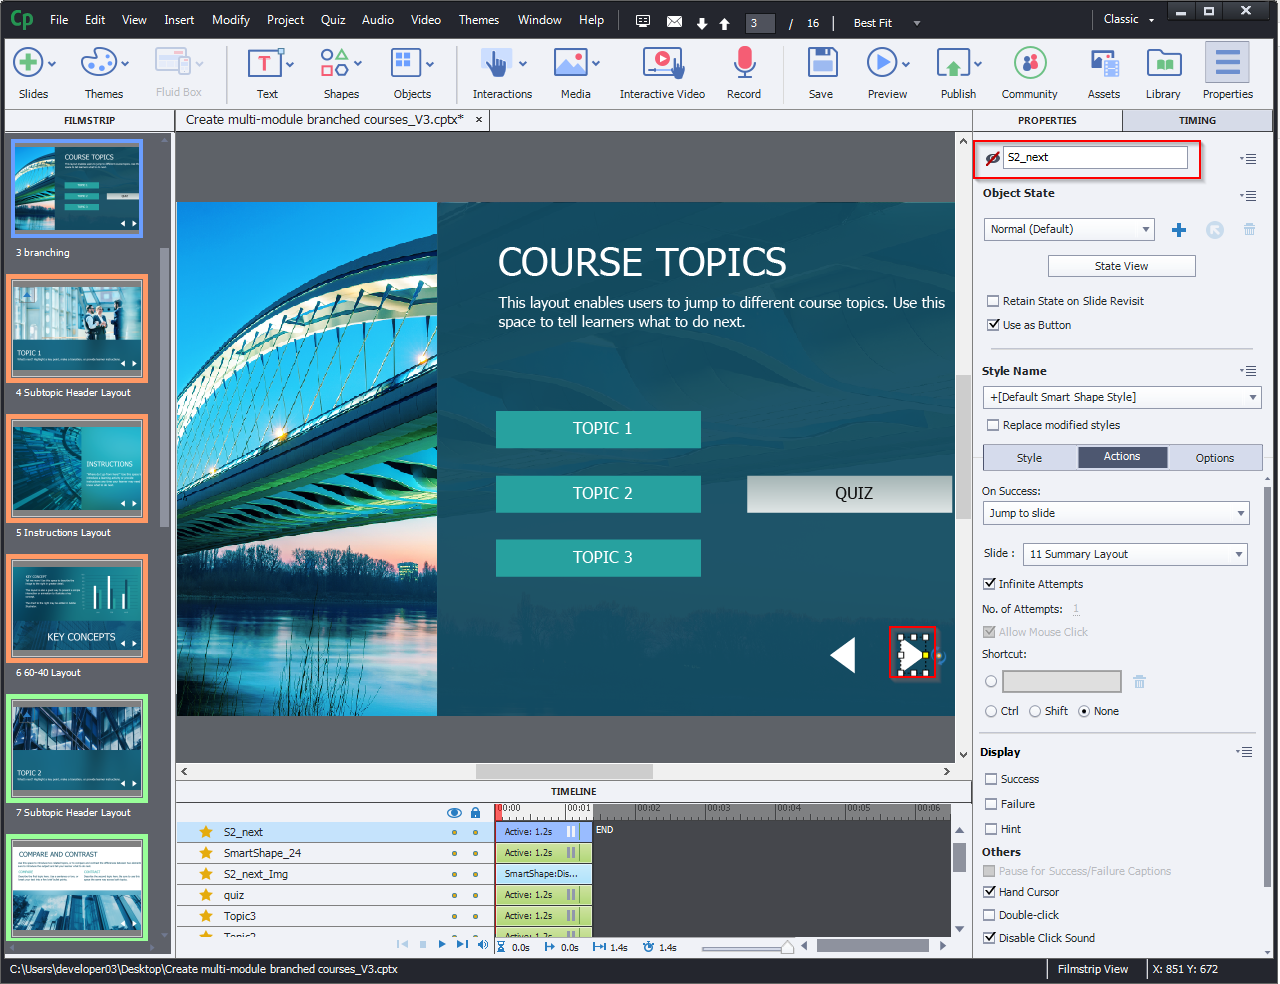 Create multi-module branched courses 7